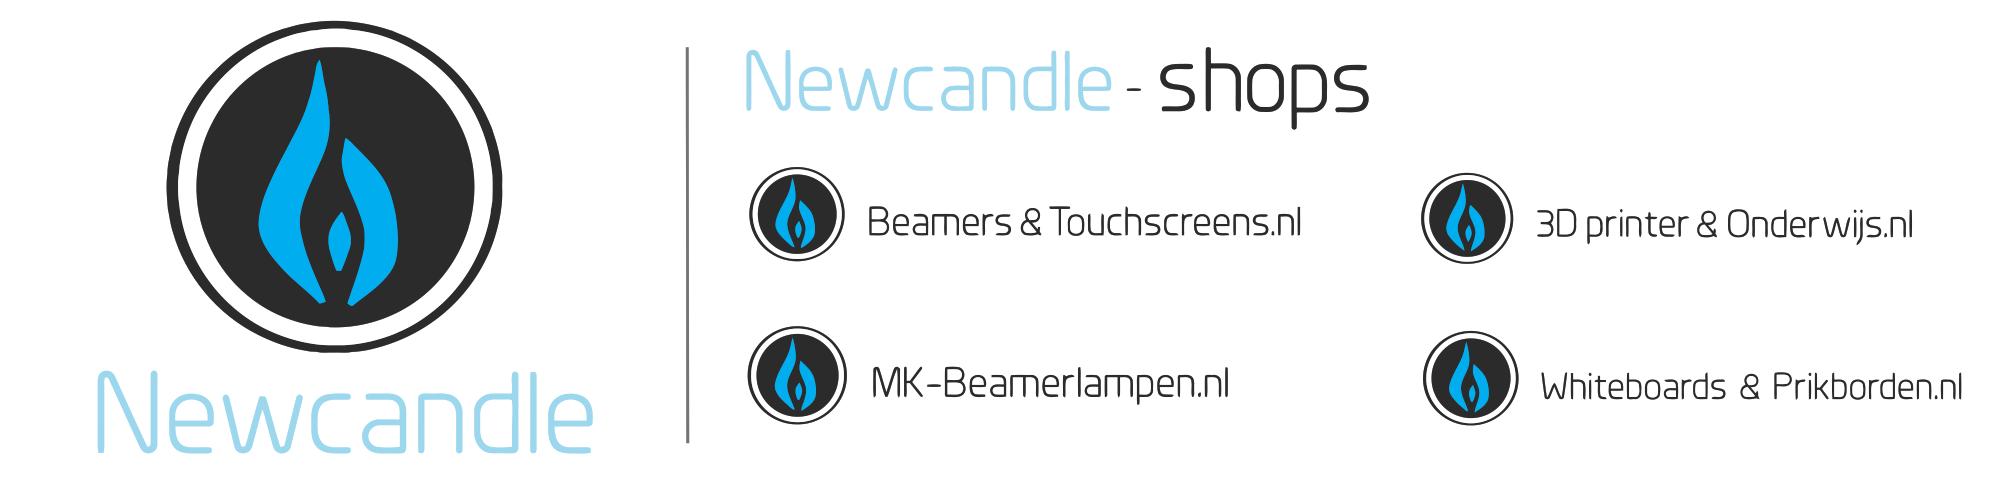 Newcandle Logo_vectorized